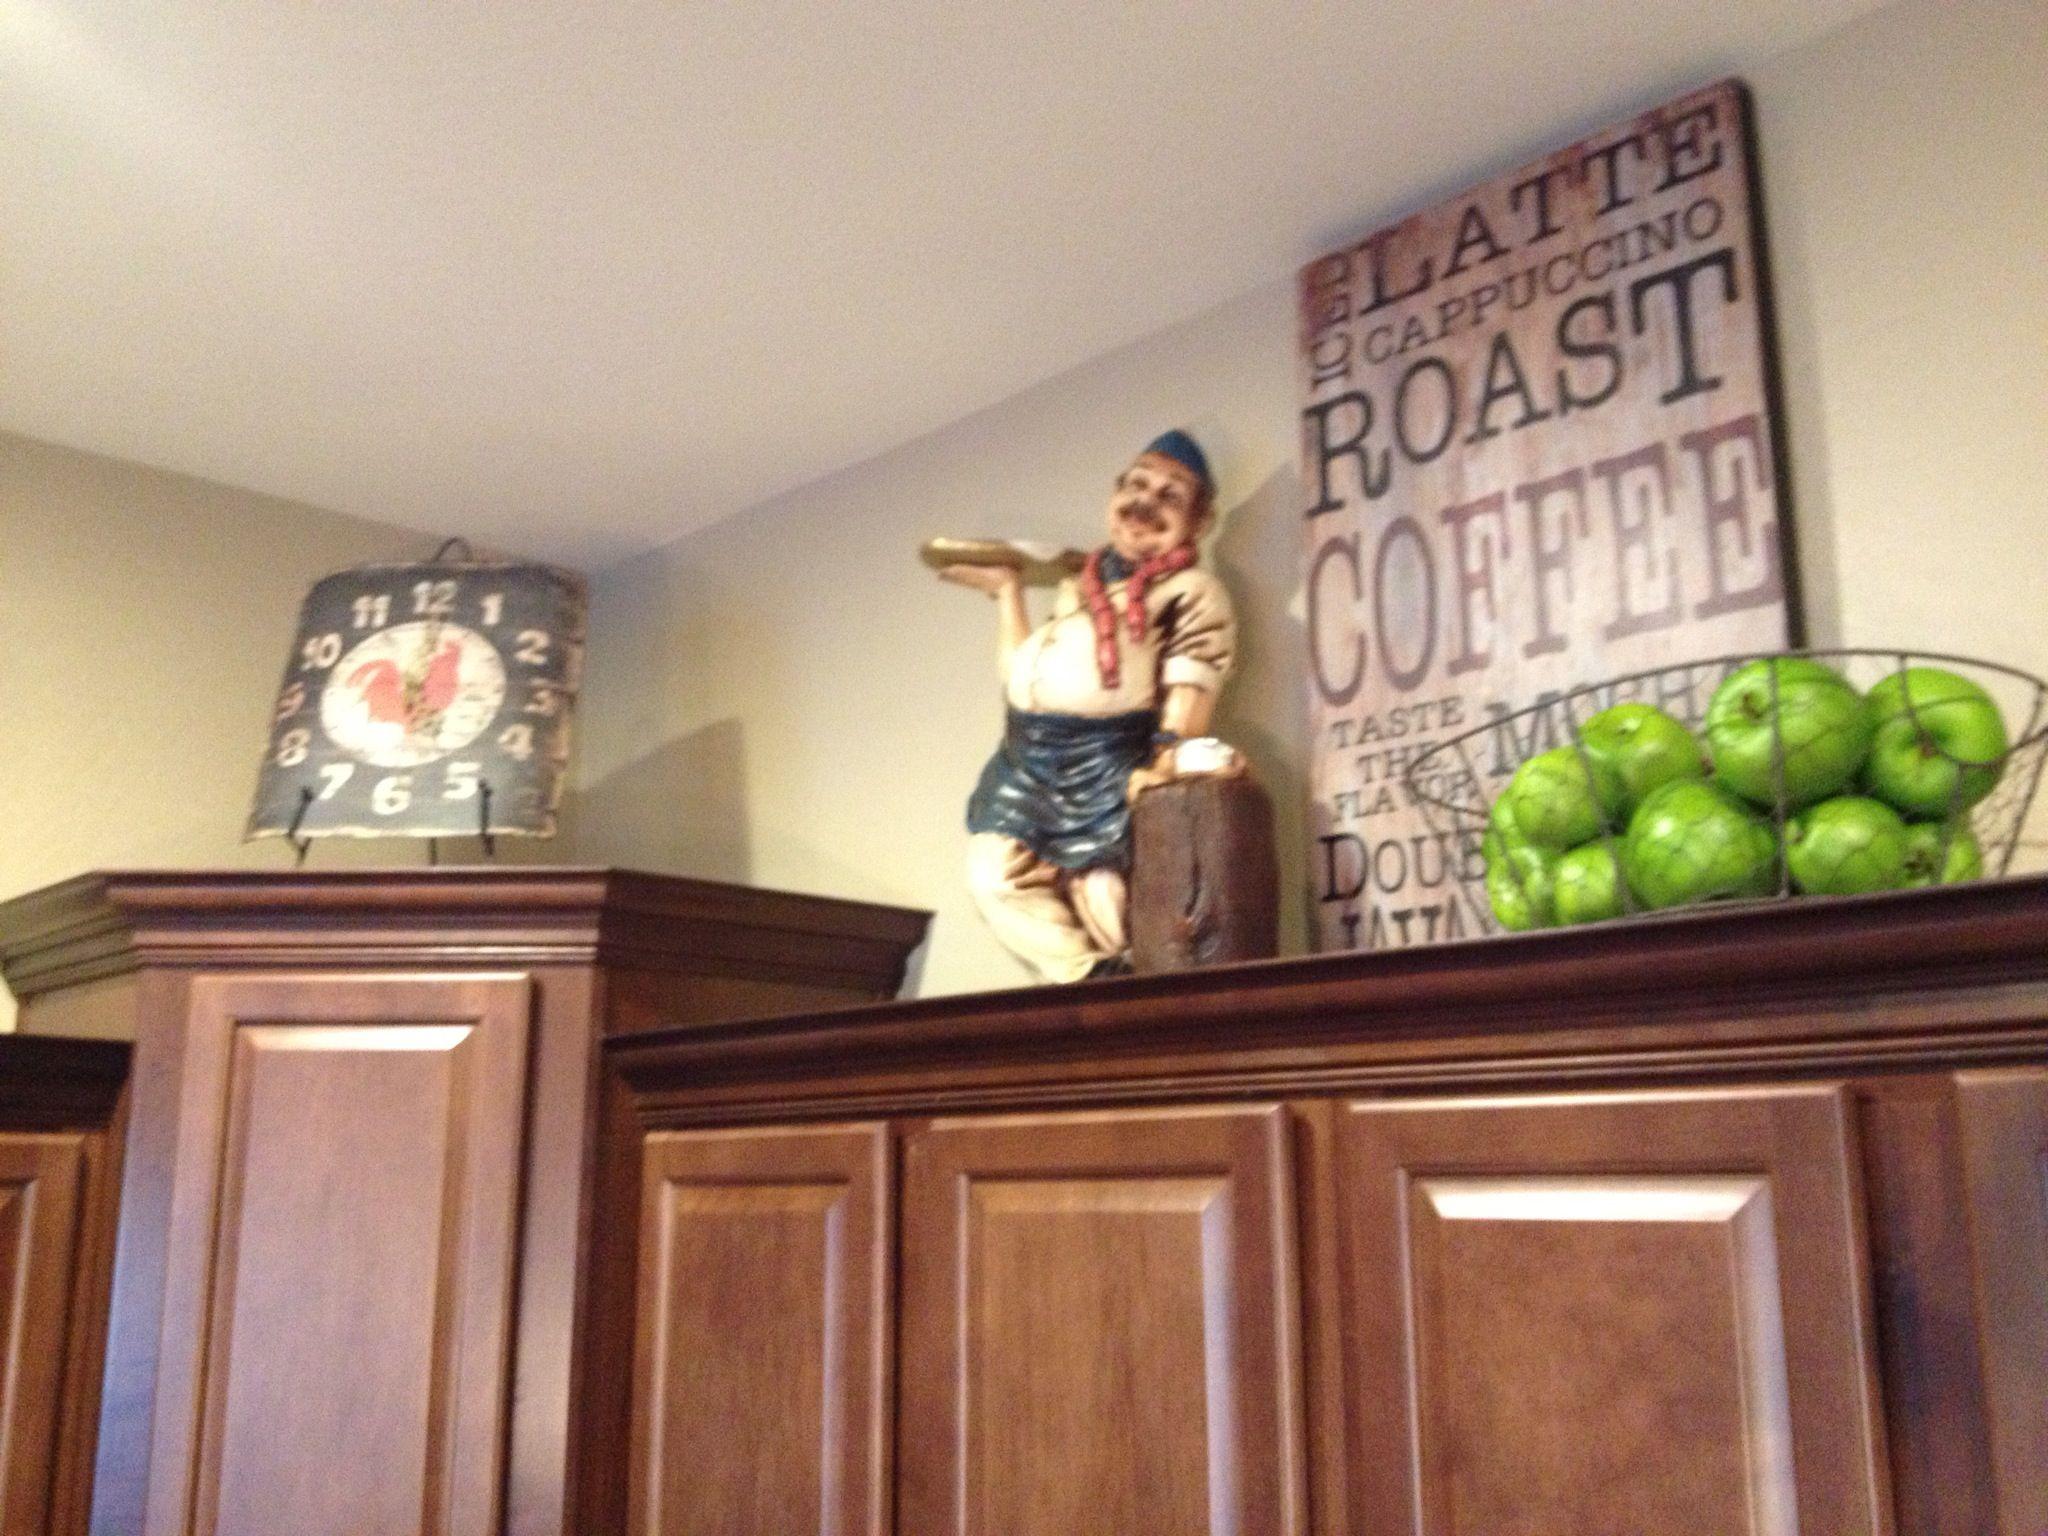 Above cabinet decor kitchen pinterest - Decor over kitchen cabinets ...